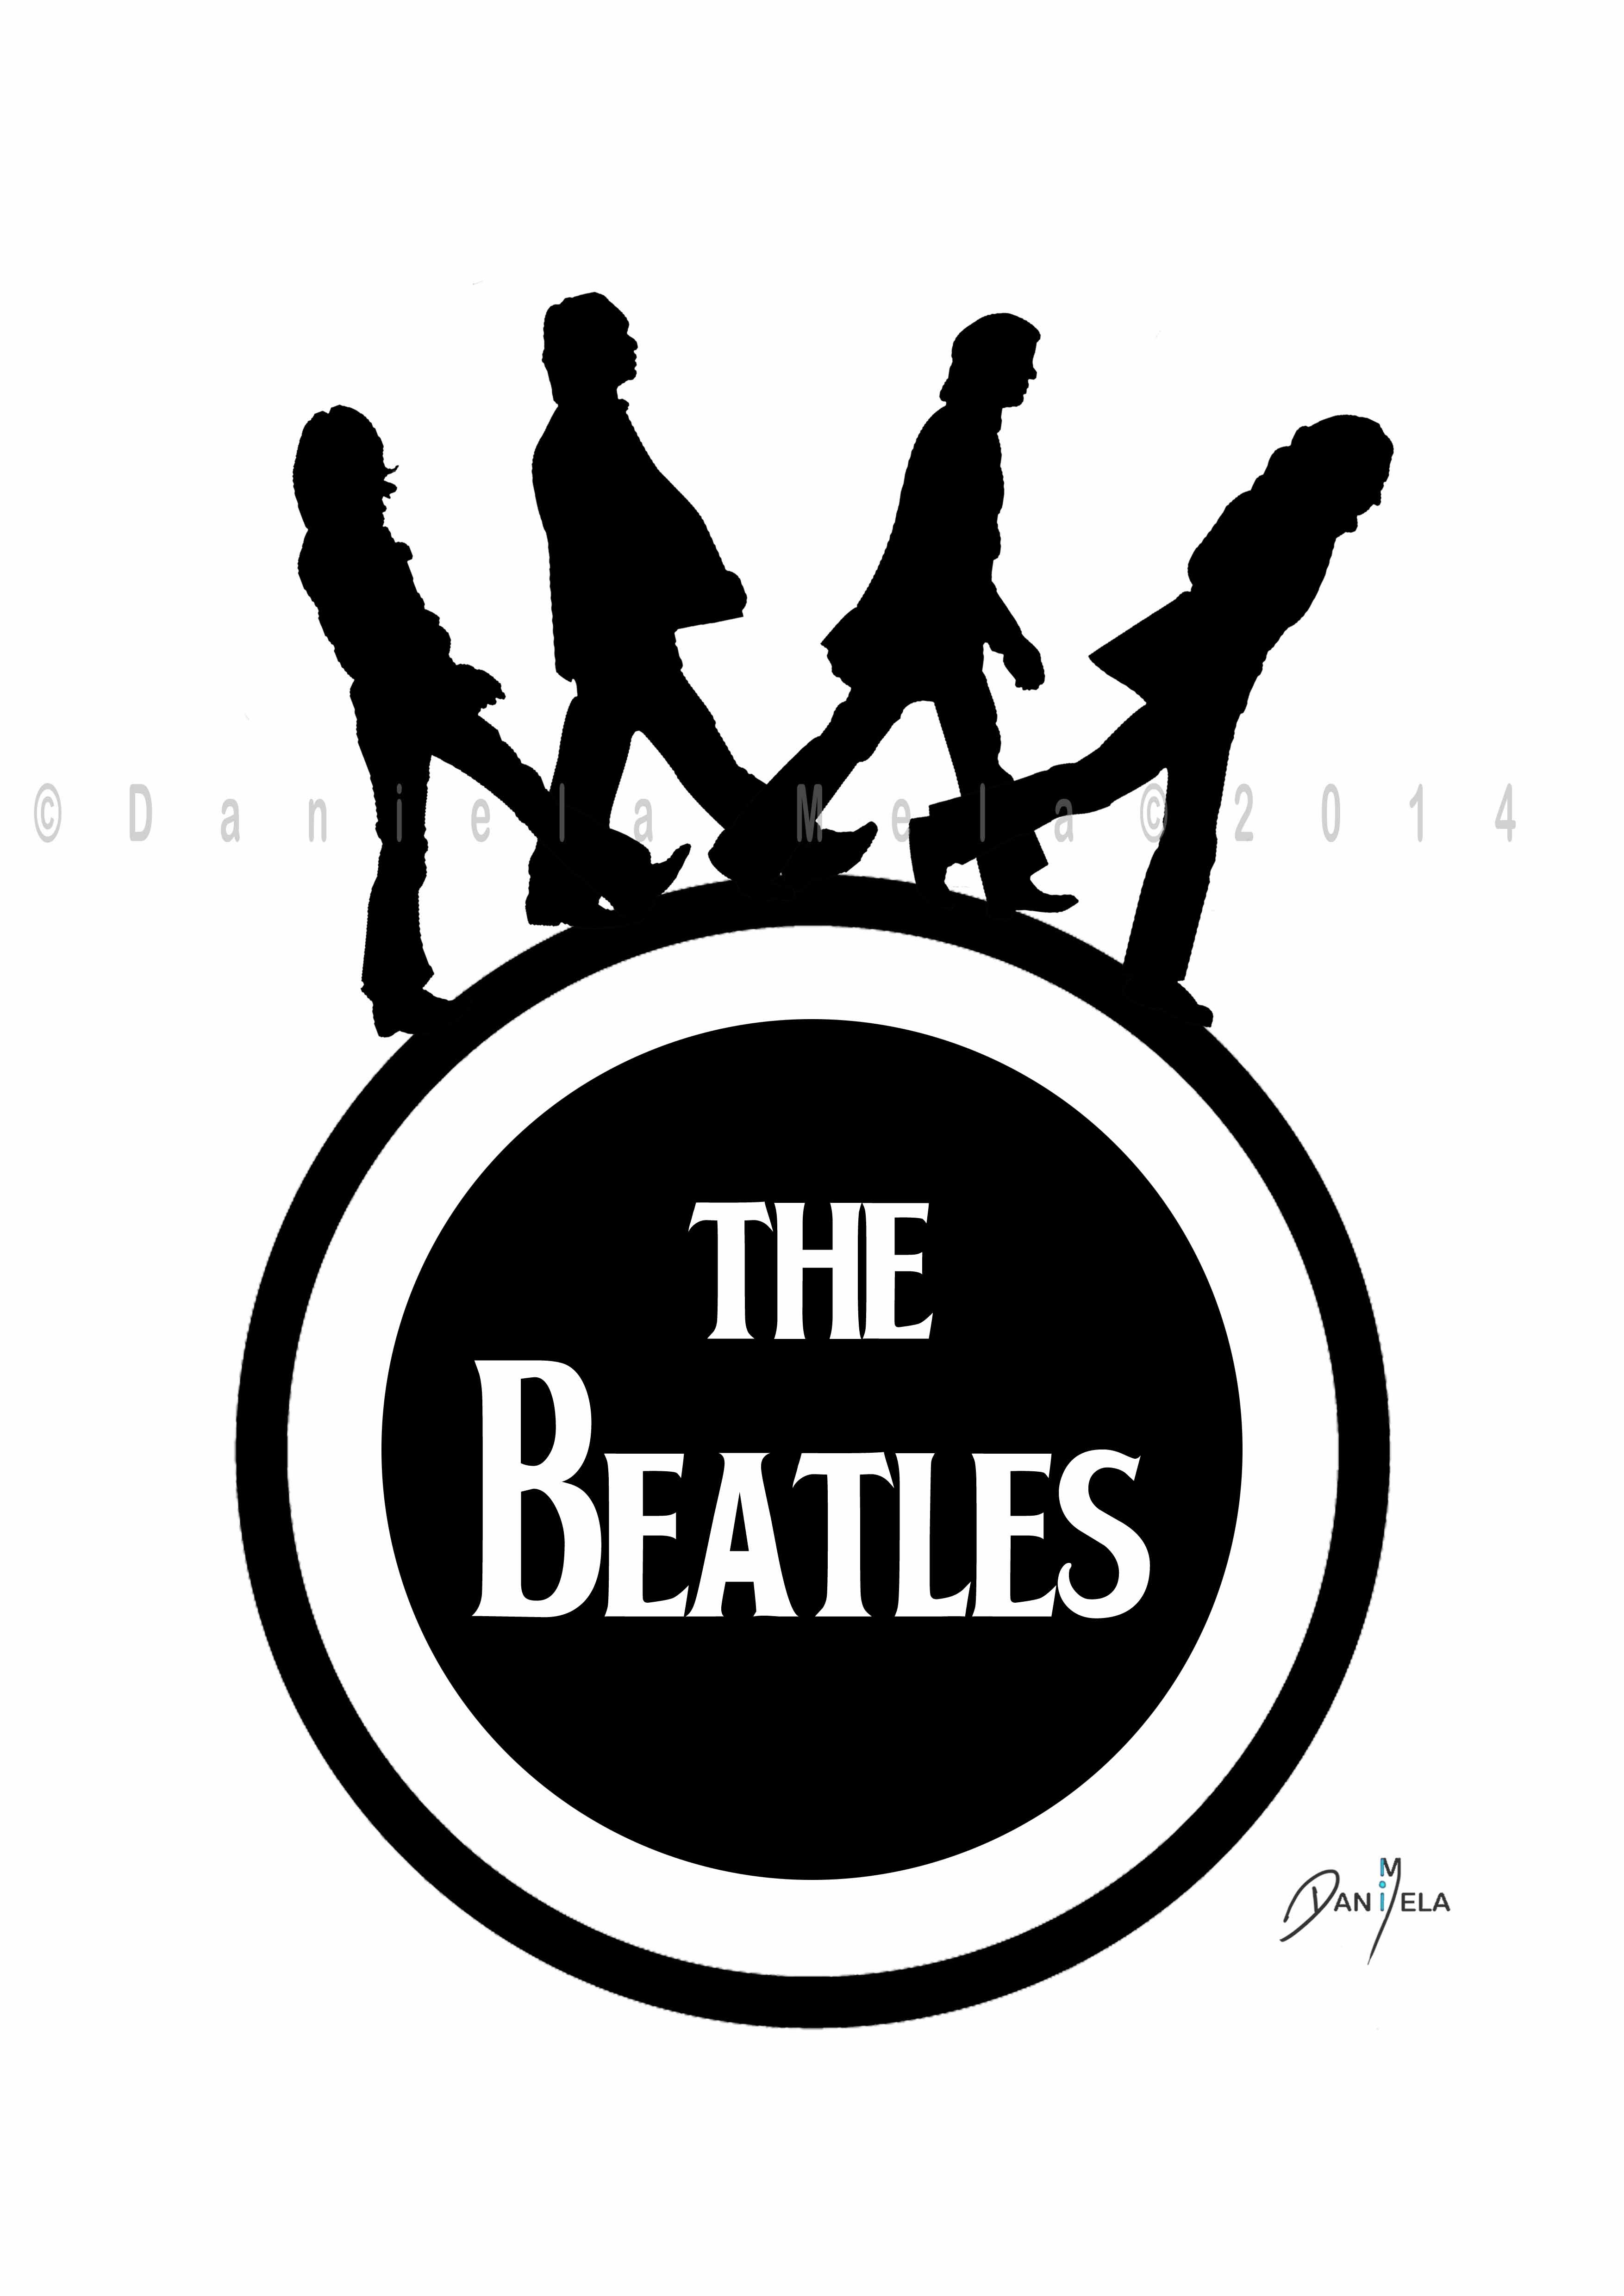 The Beatles Logos